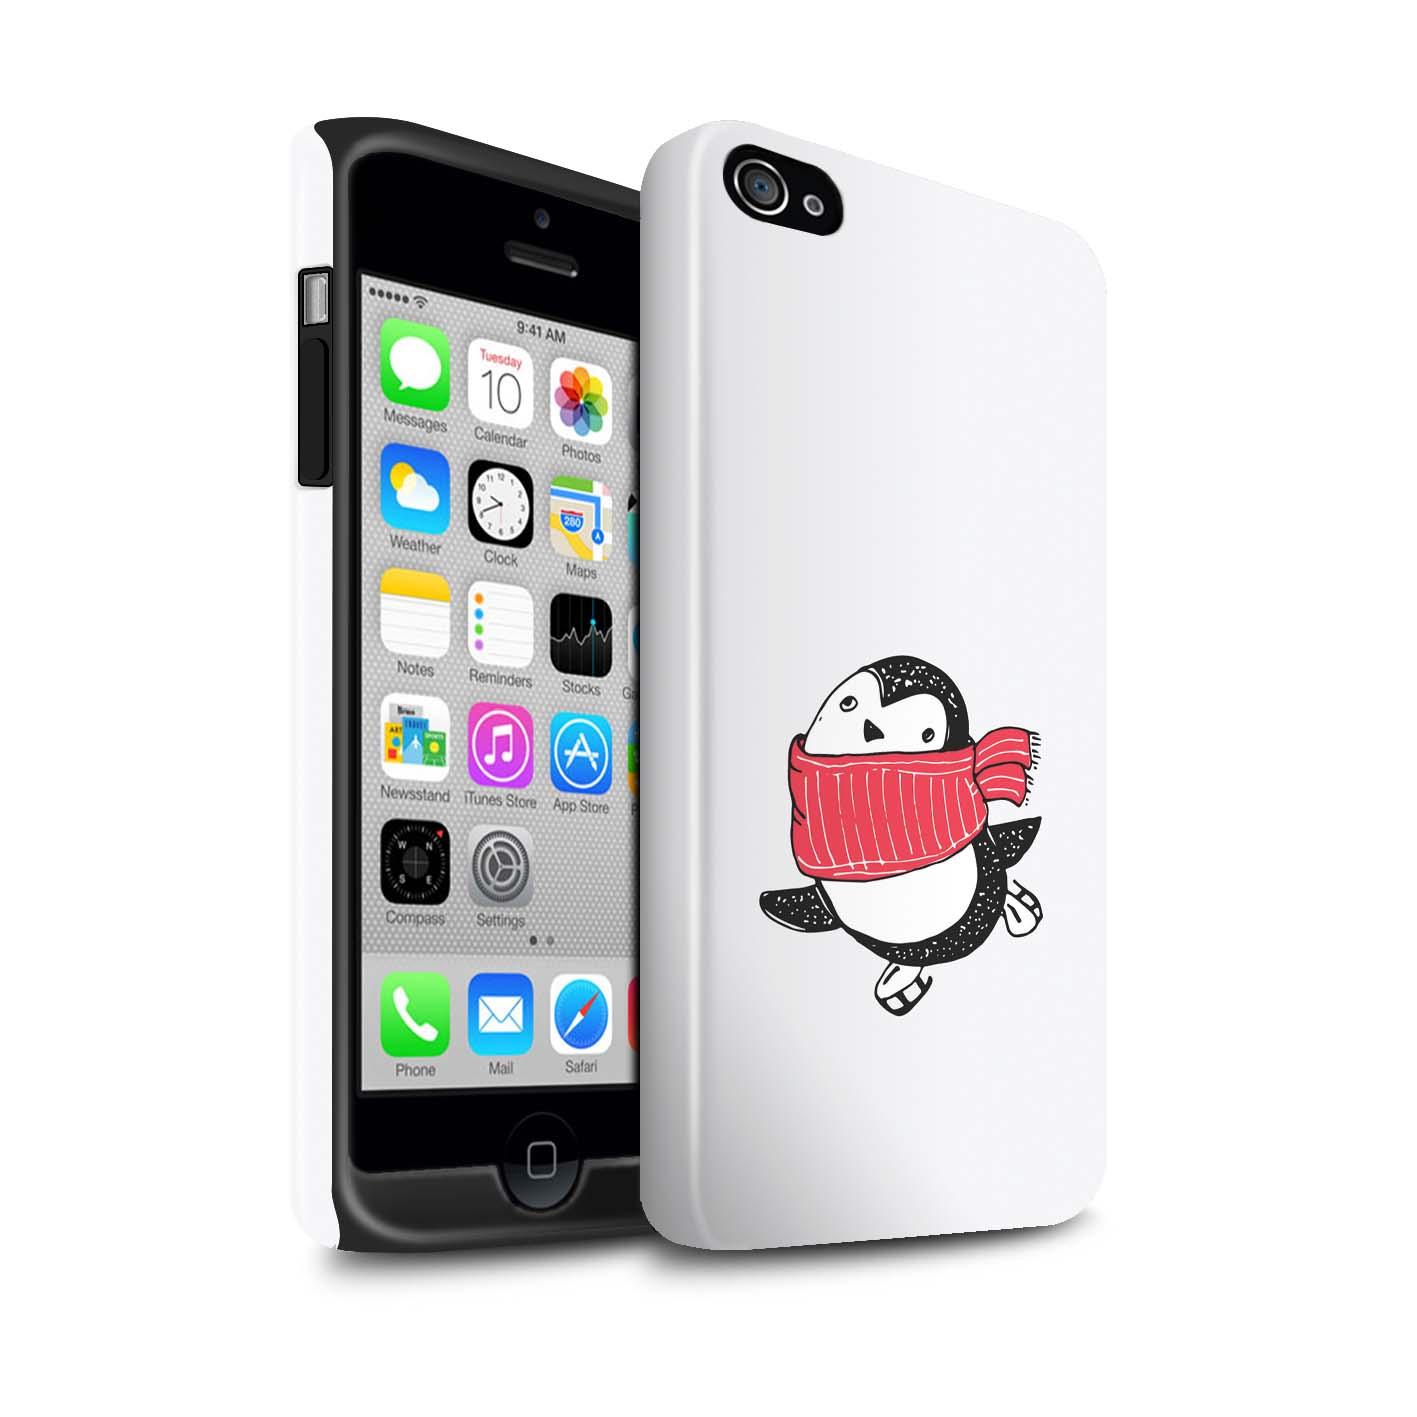 STUFF4-Gloss-Tough-Phone-Case-for-Apple-iPhone-4-4S-Cute-Doodle-Penguin